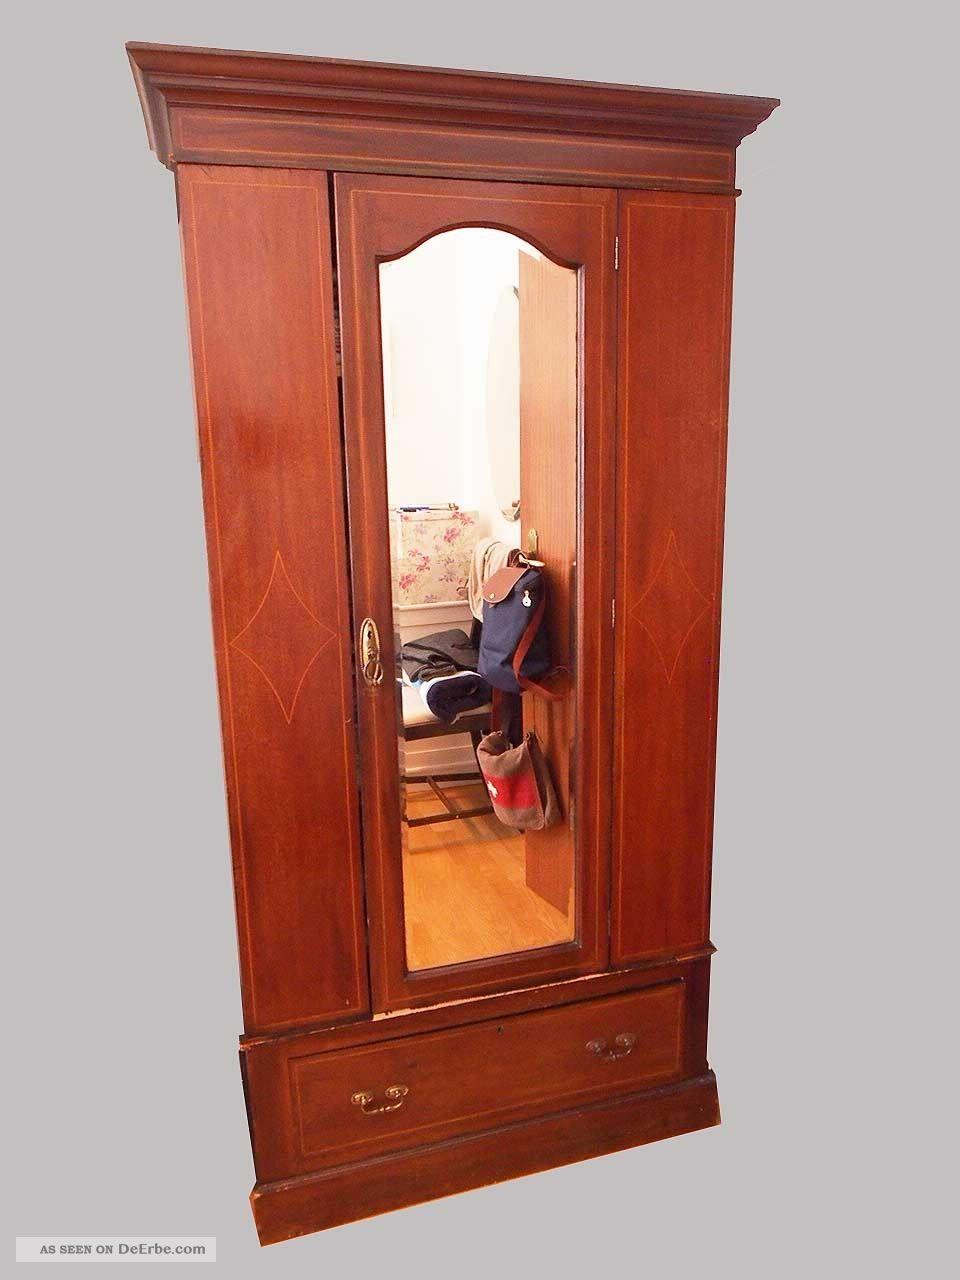 sch ner w sche schrank mahagoni um 1910 england. Black Bedroom Furniture Sets. Home Design Ideas